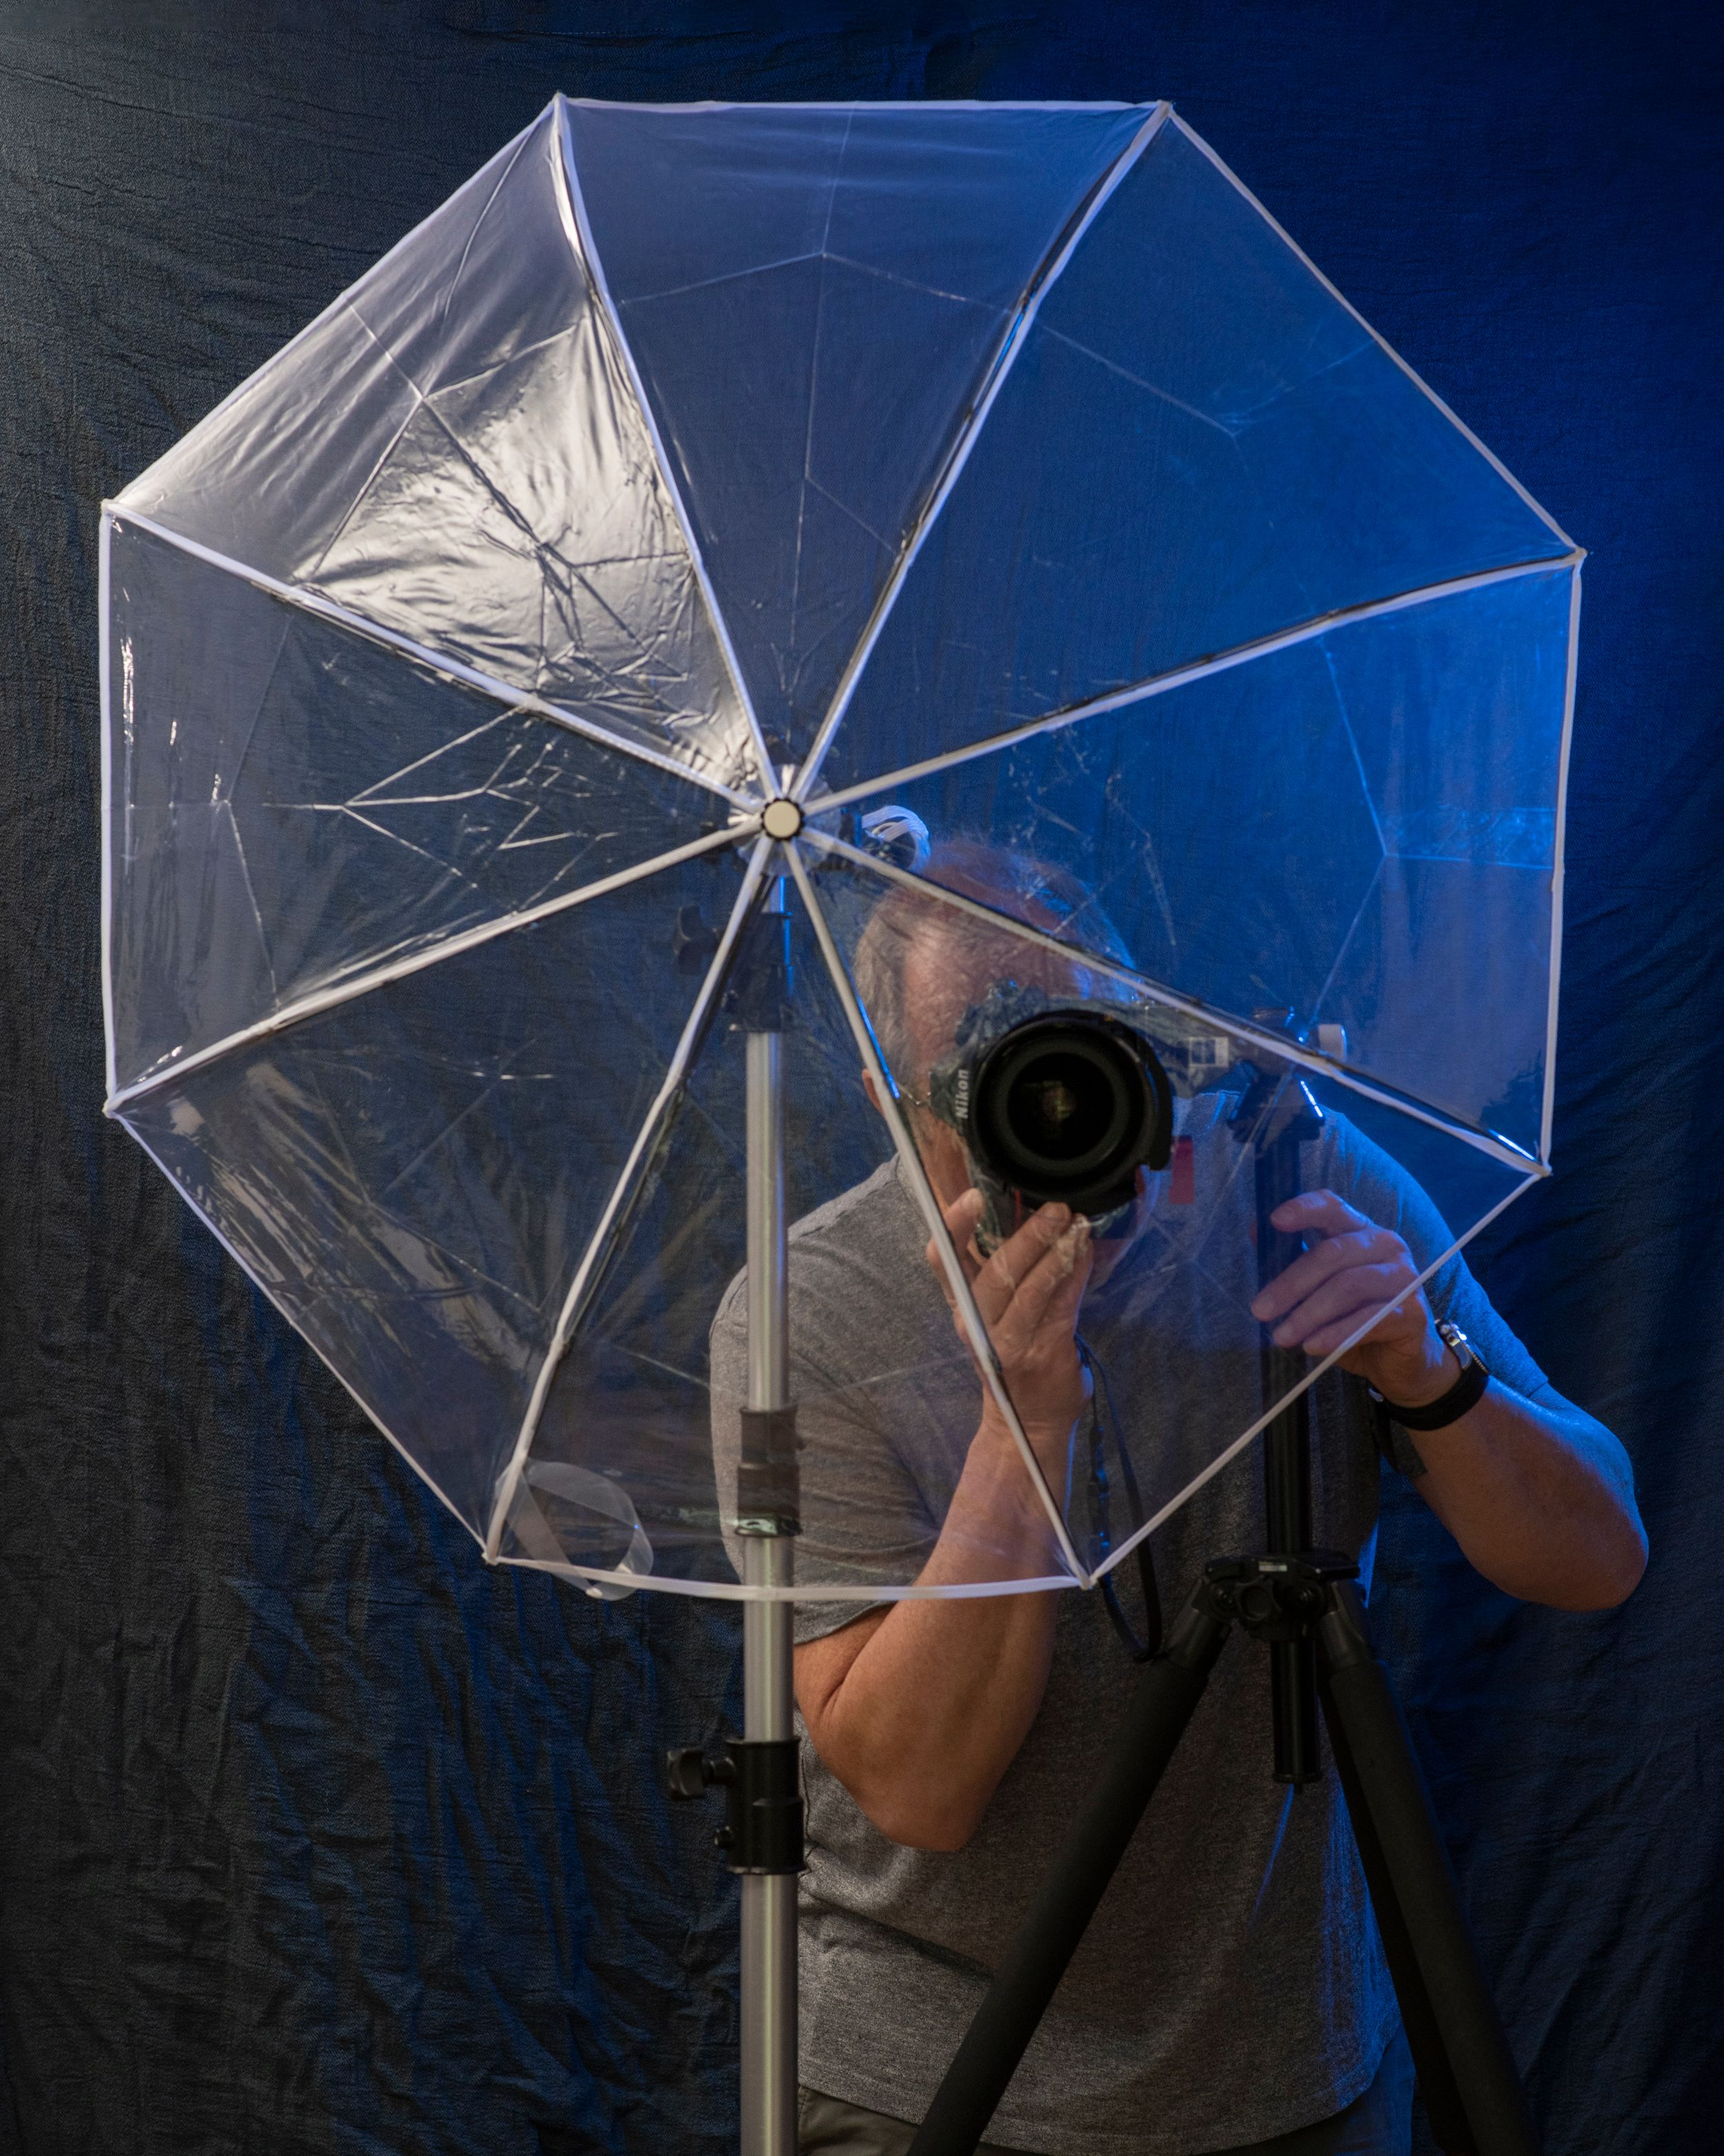 Transpaent Umbrella with photographer